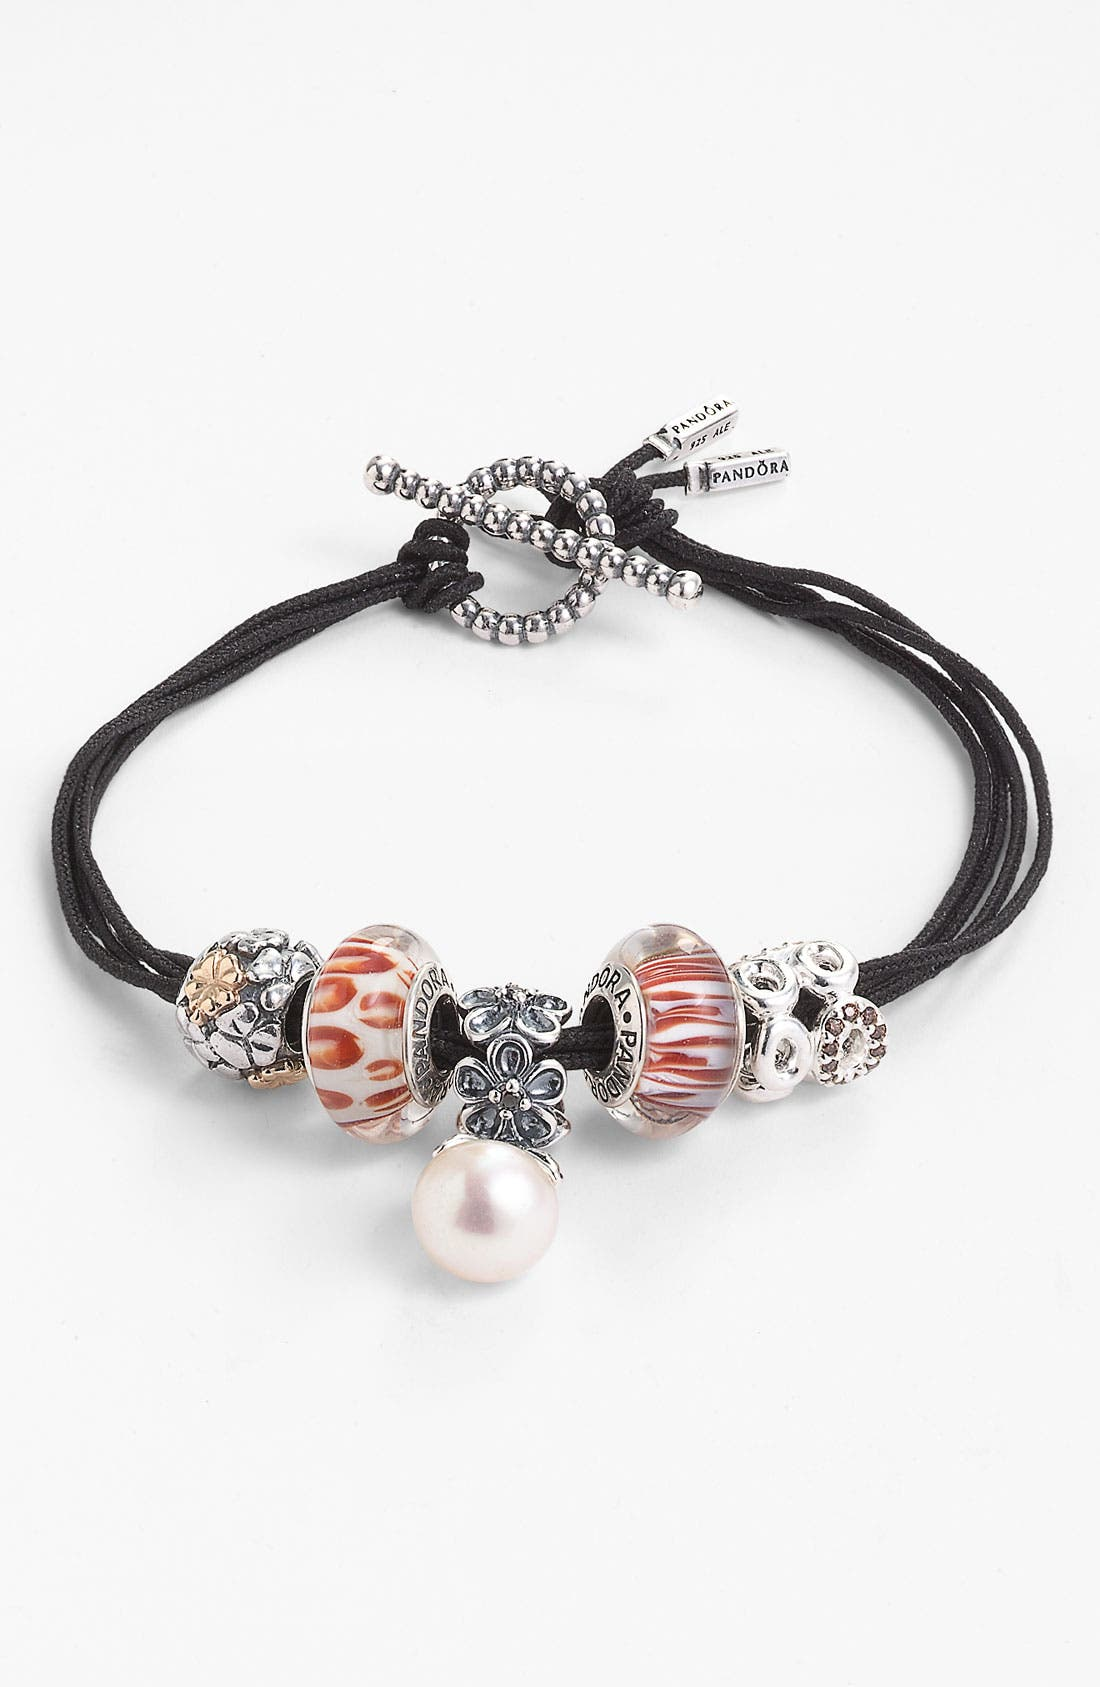 Alternate Image 1 Selected - PANDORA Customizable Charm Bracelet